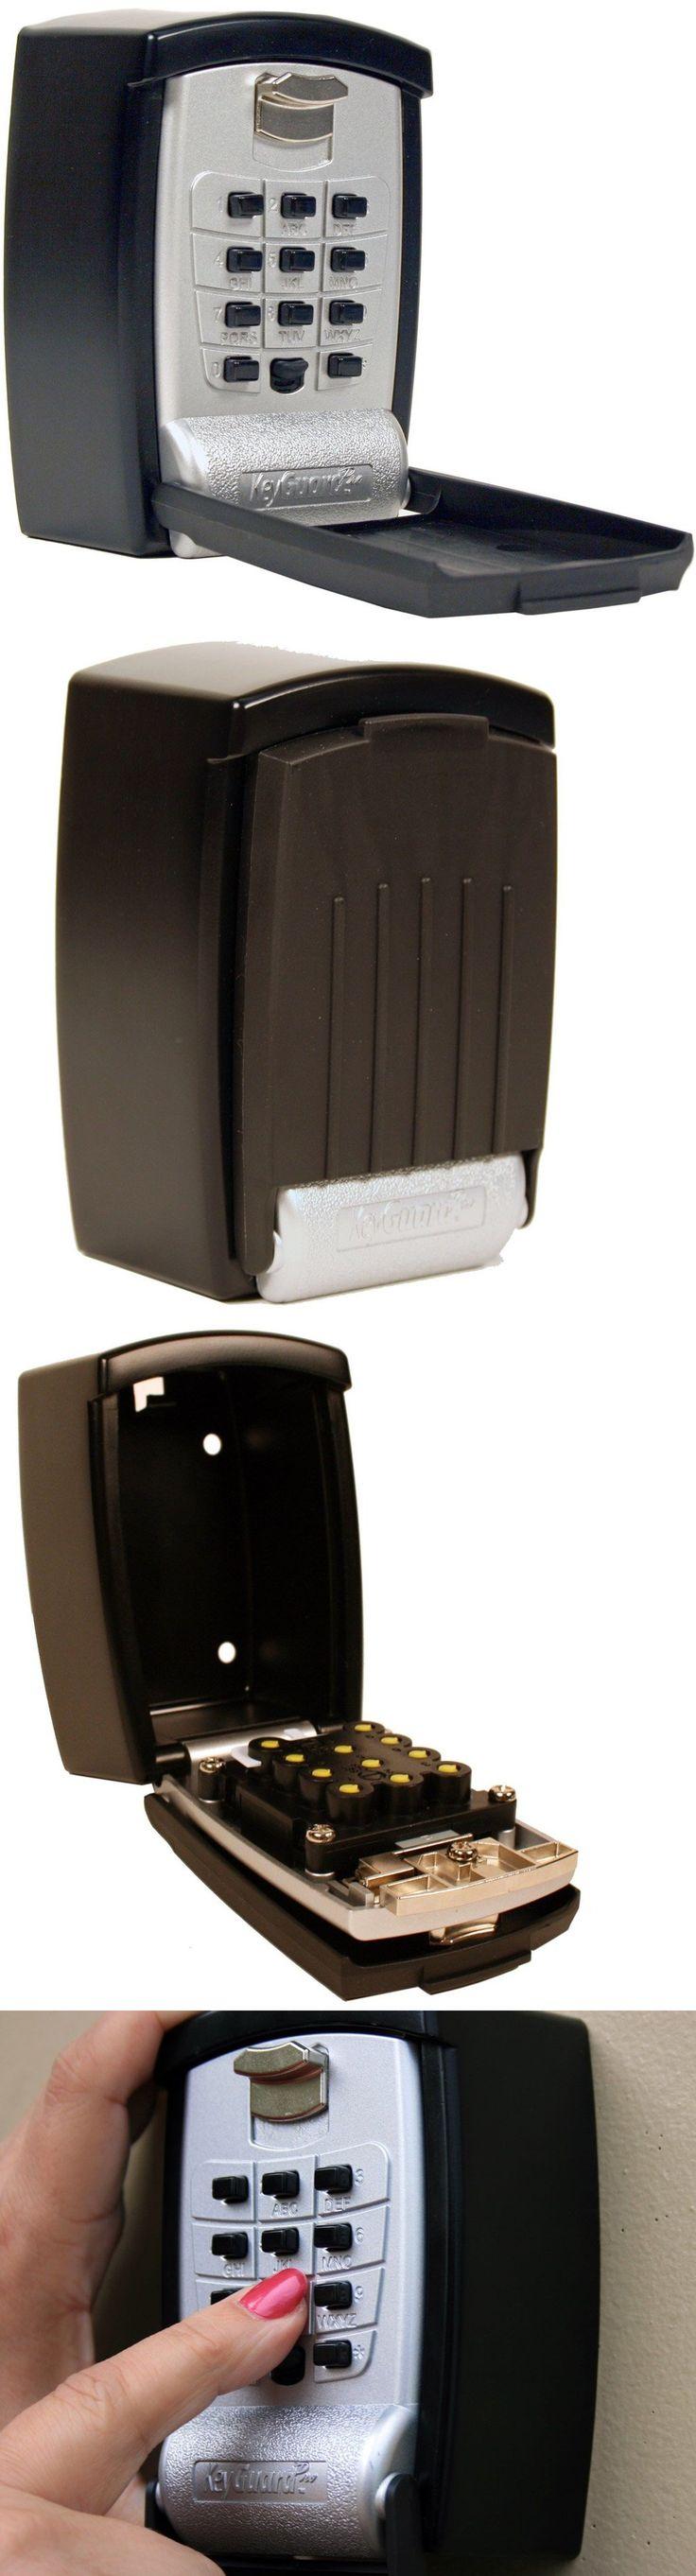 Hide-a-Keys 115945: Keyguard Sl-590 Punch Button Key Storage Wall Mount Lock Box -> BUY IT NOW ONLY: $38.49 on eBay!